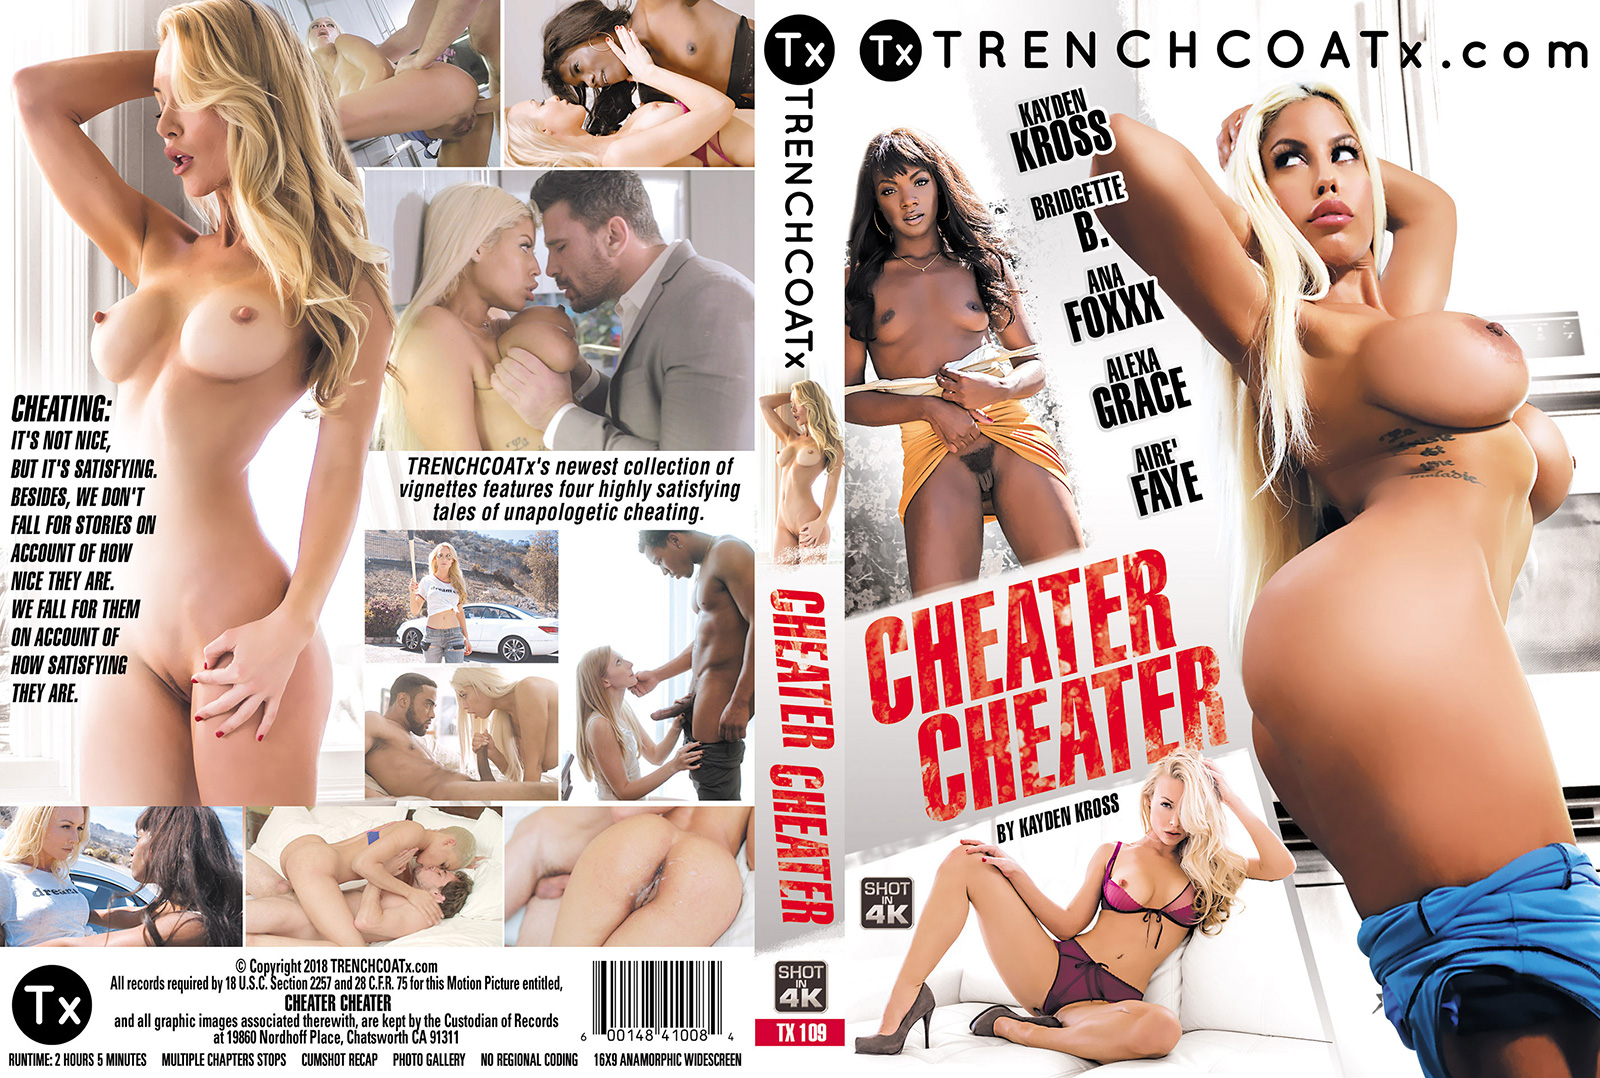 Cheater Cheater DVD